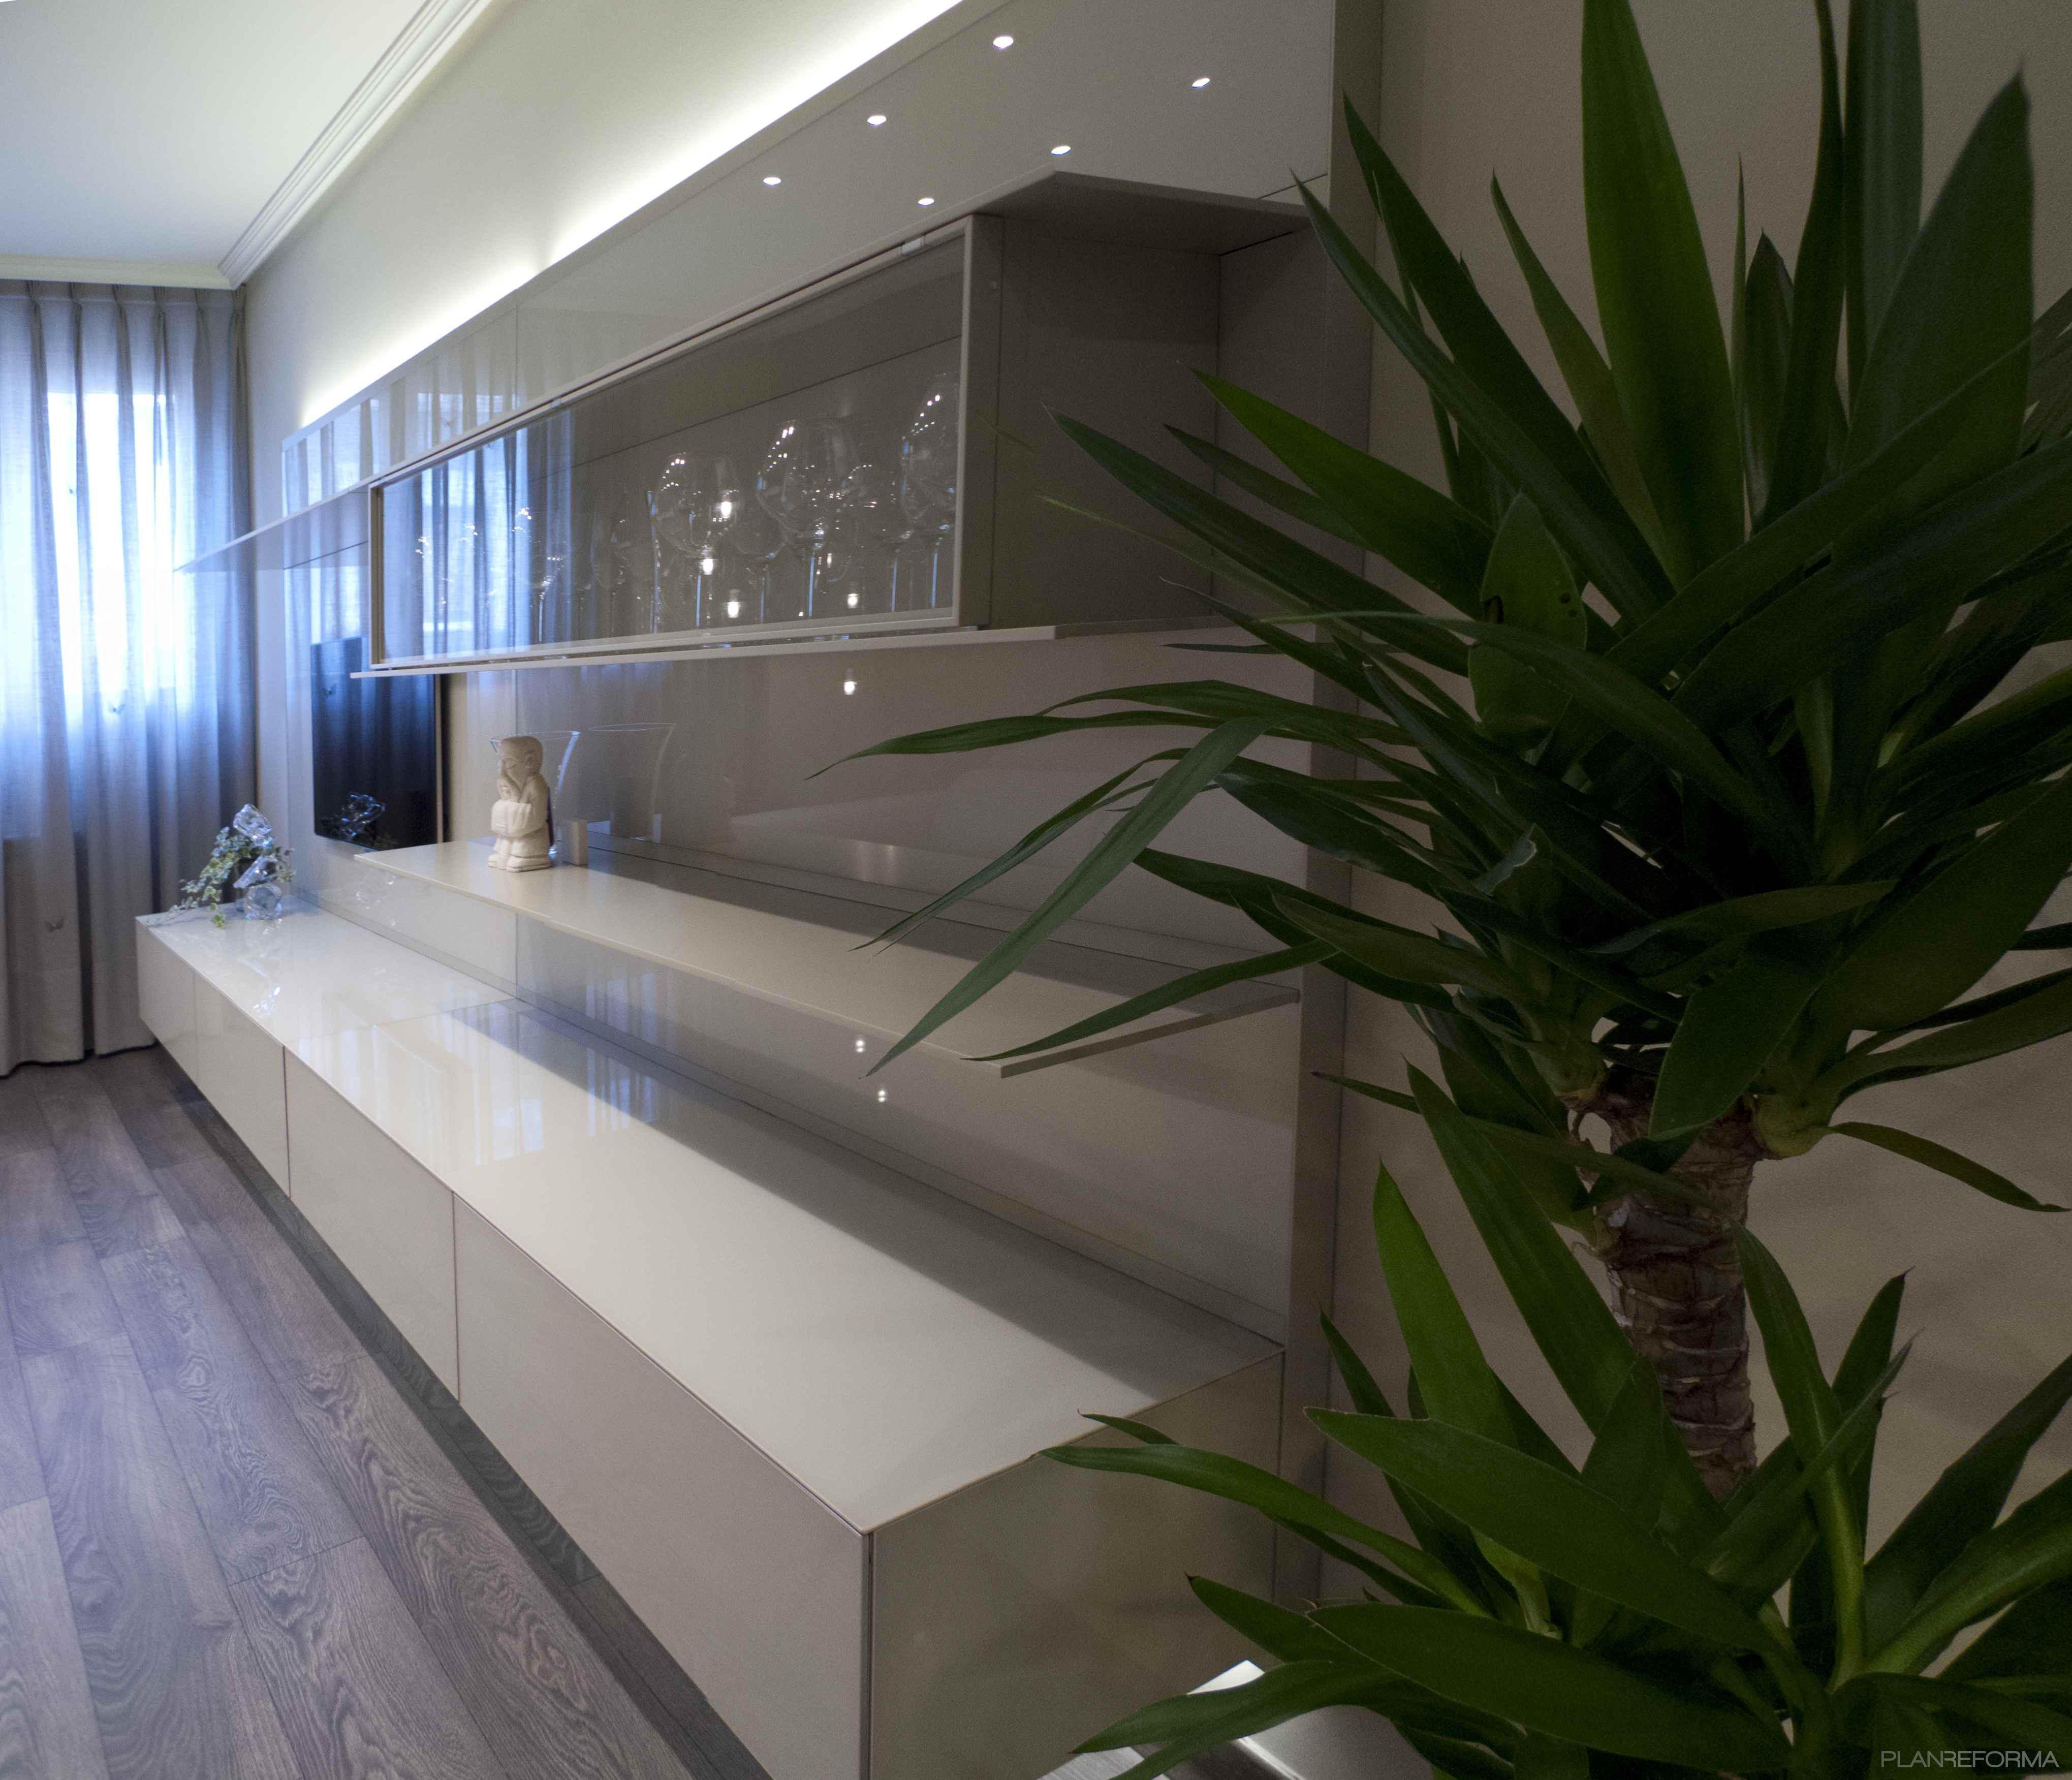 Sala de la tv salon estilo moderno color beige blanco gris - Interiorismo salones modernos ...